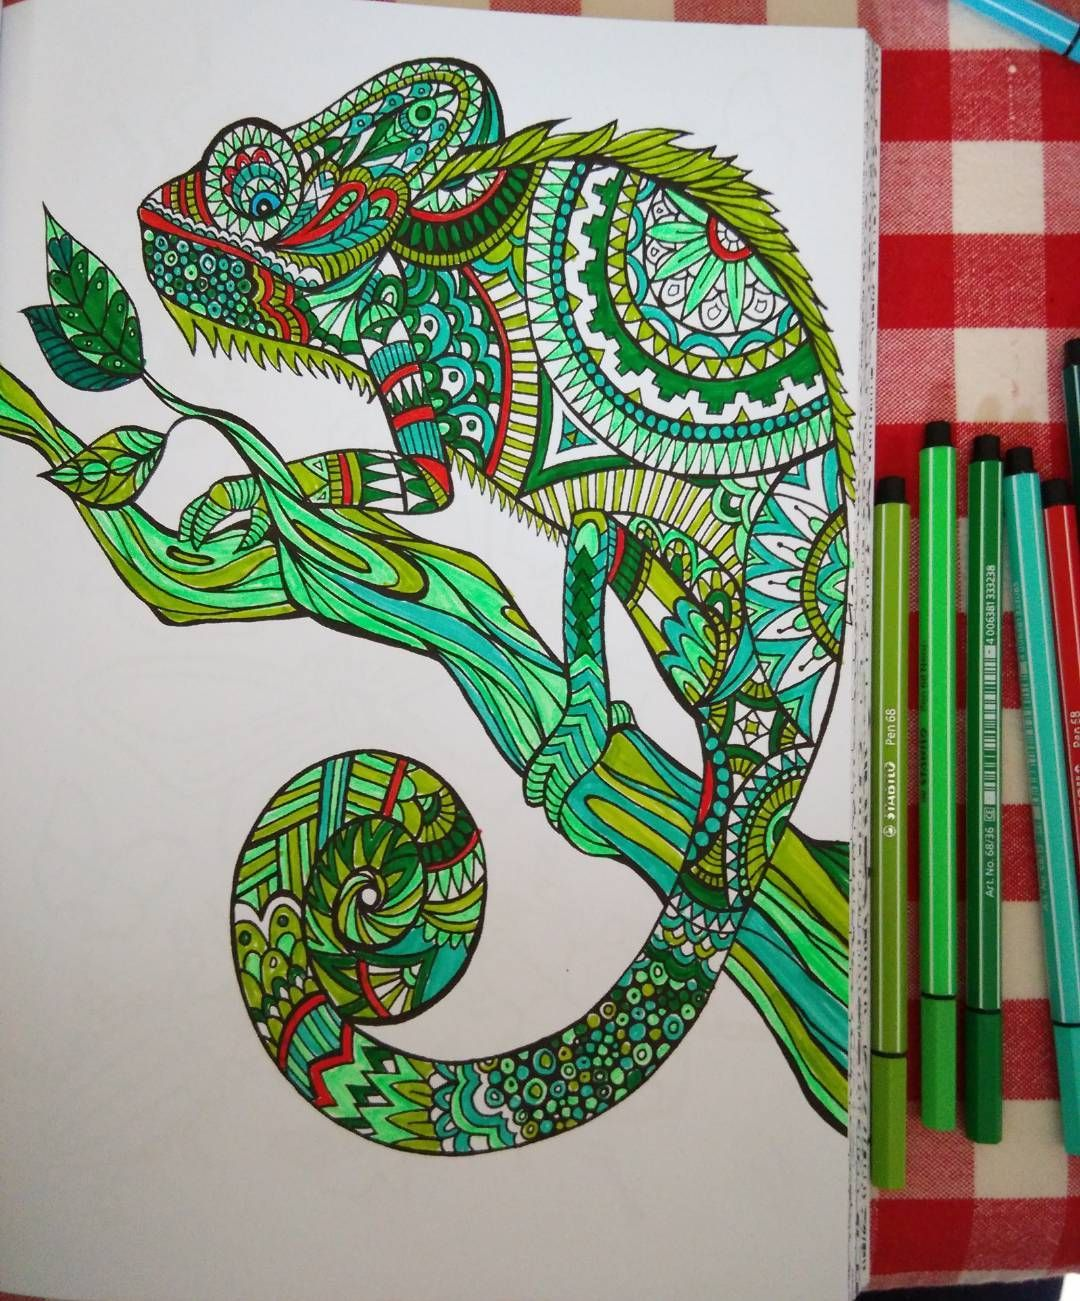 Mon iguane_ #iguana #bestiaireextraordinaire #100coloriagesantistress #coloriageadulte #coloriageantistress #stabilo68